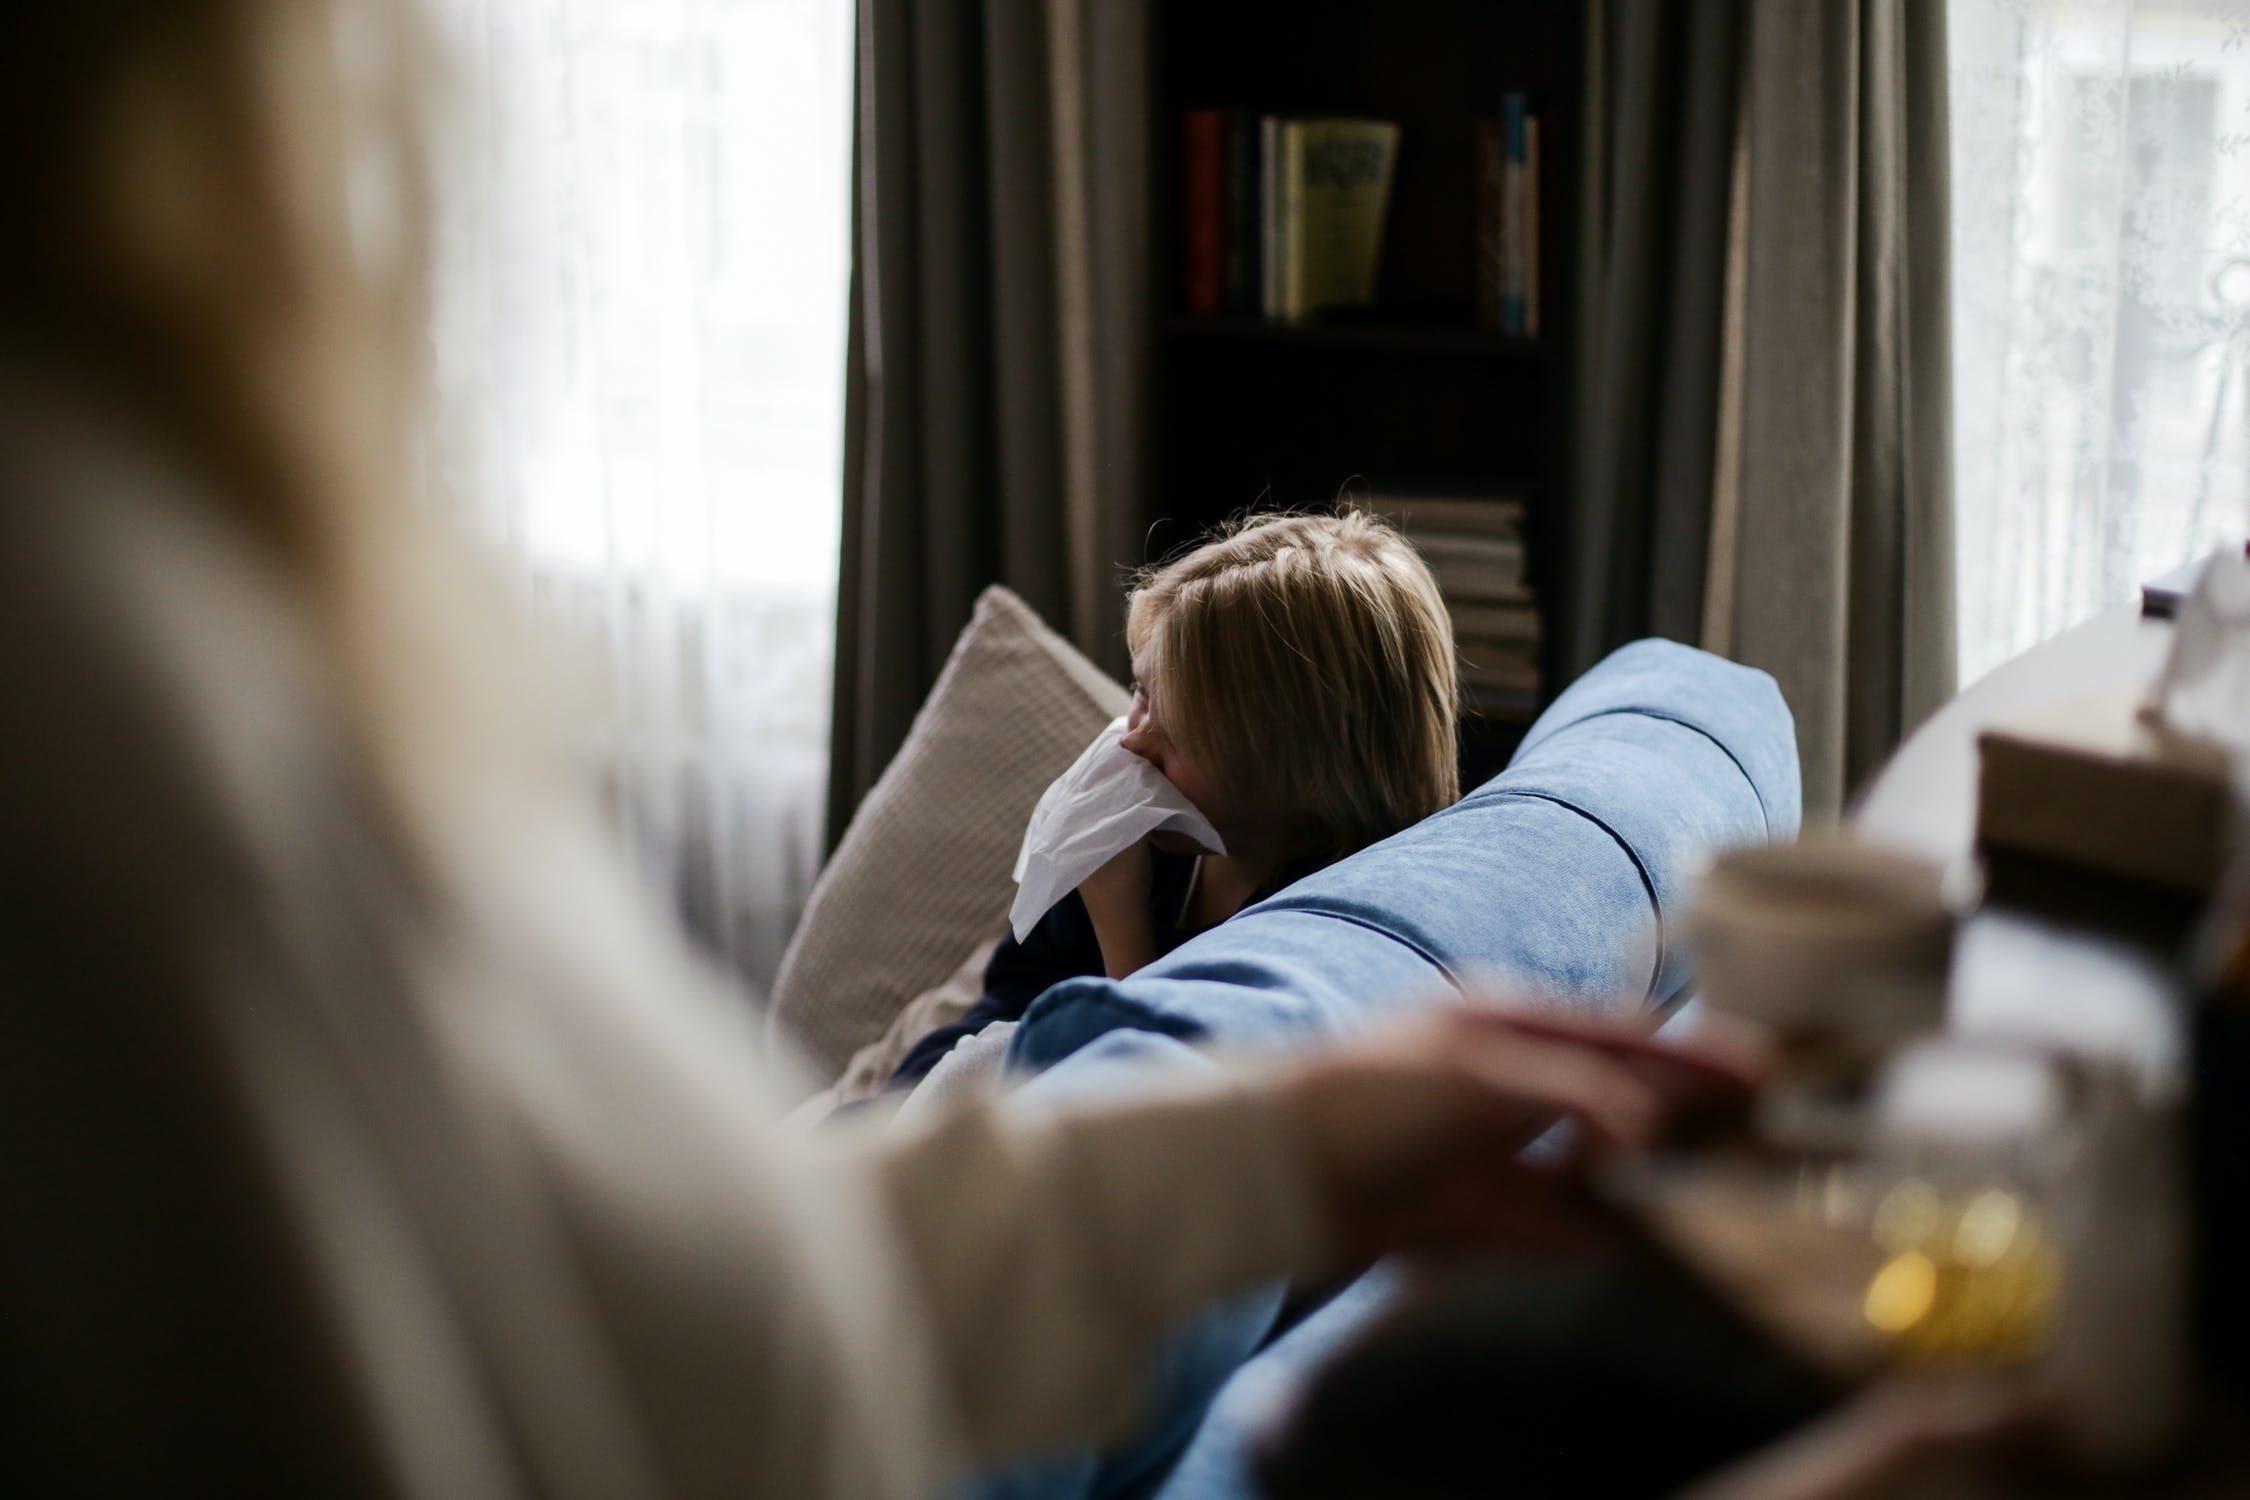 Imunitu detí oslabuje aj stres / Zdroj: Pexels /cottonbro